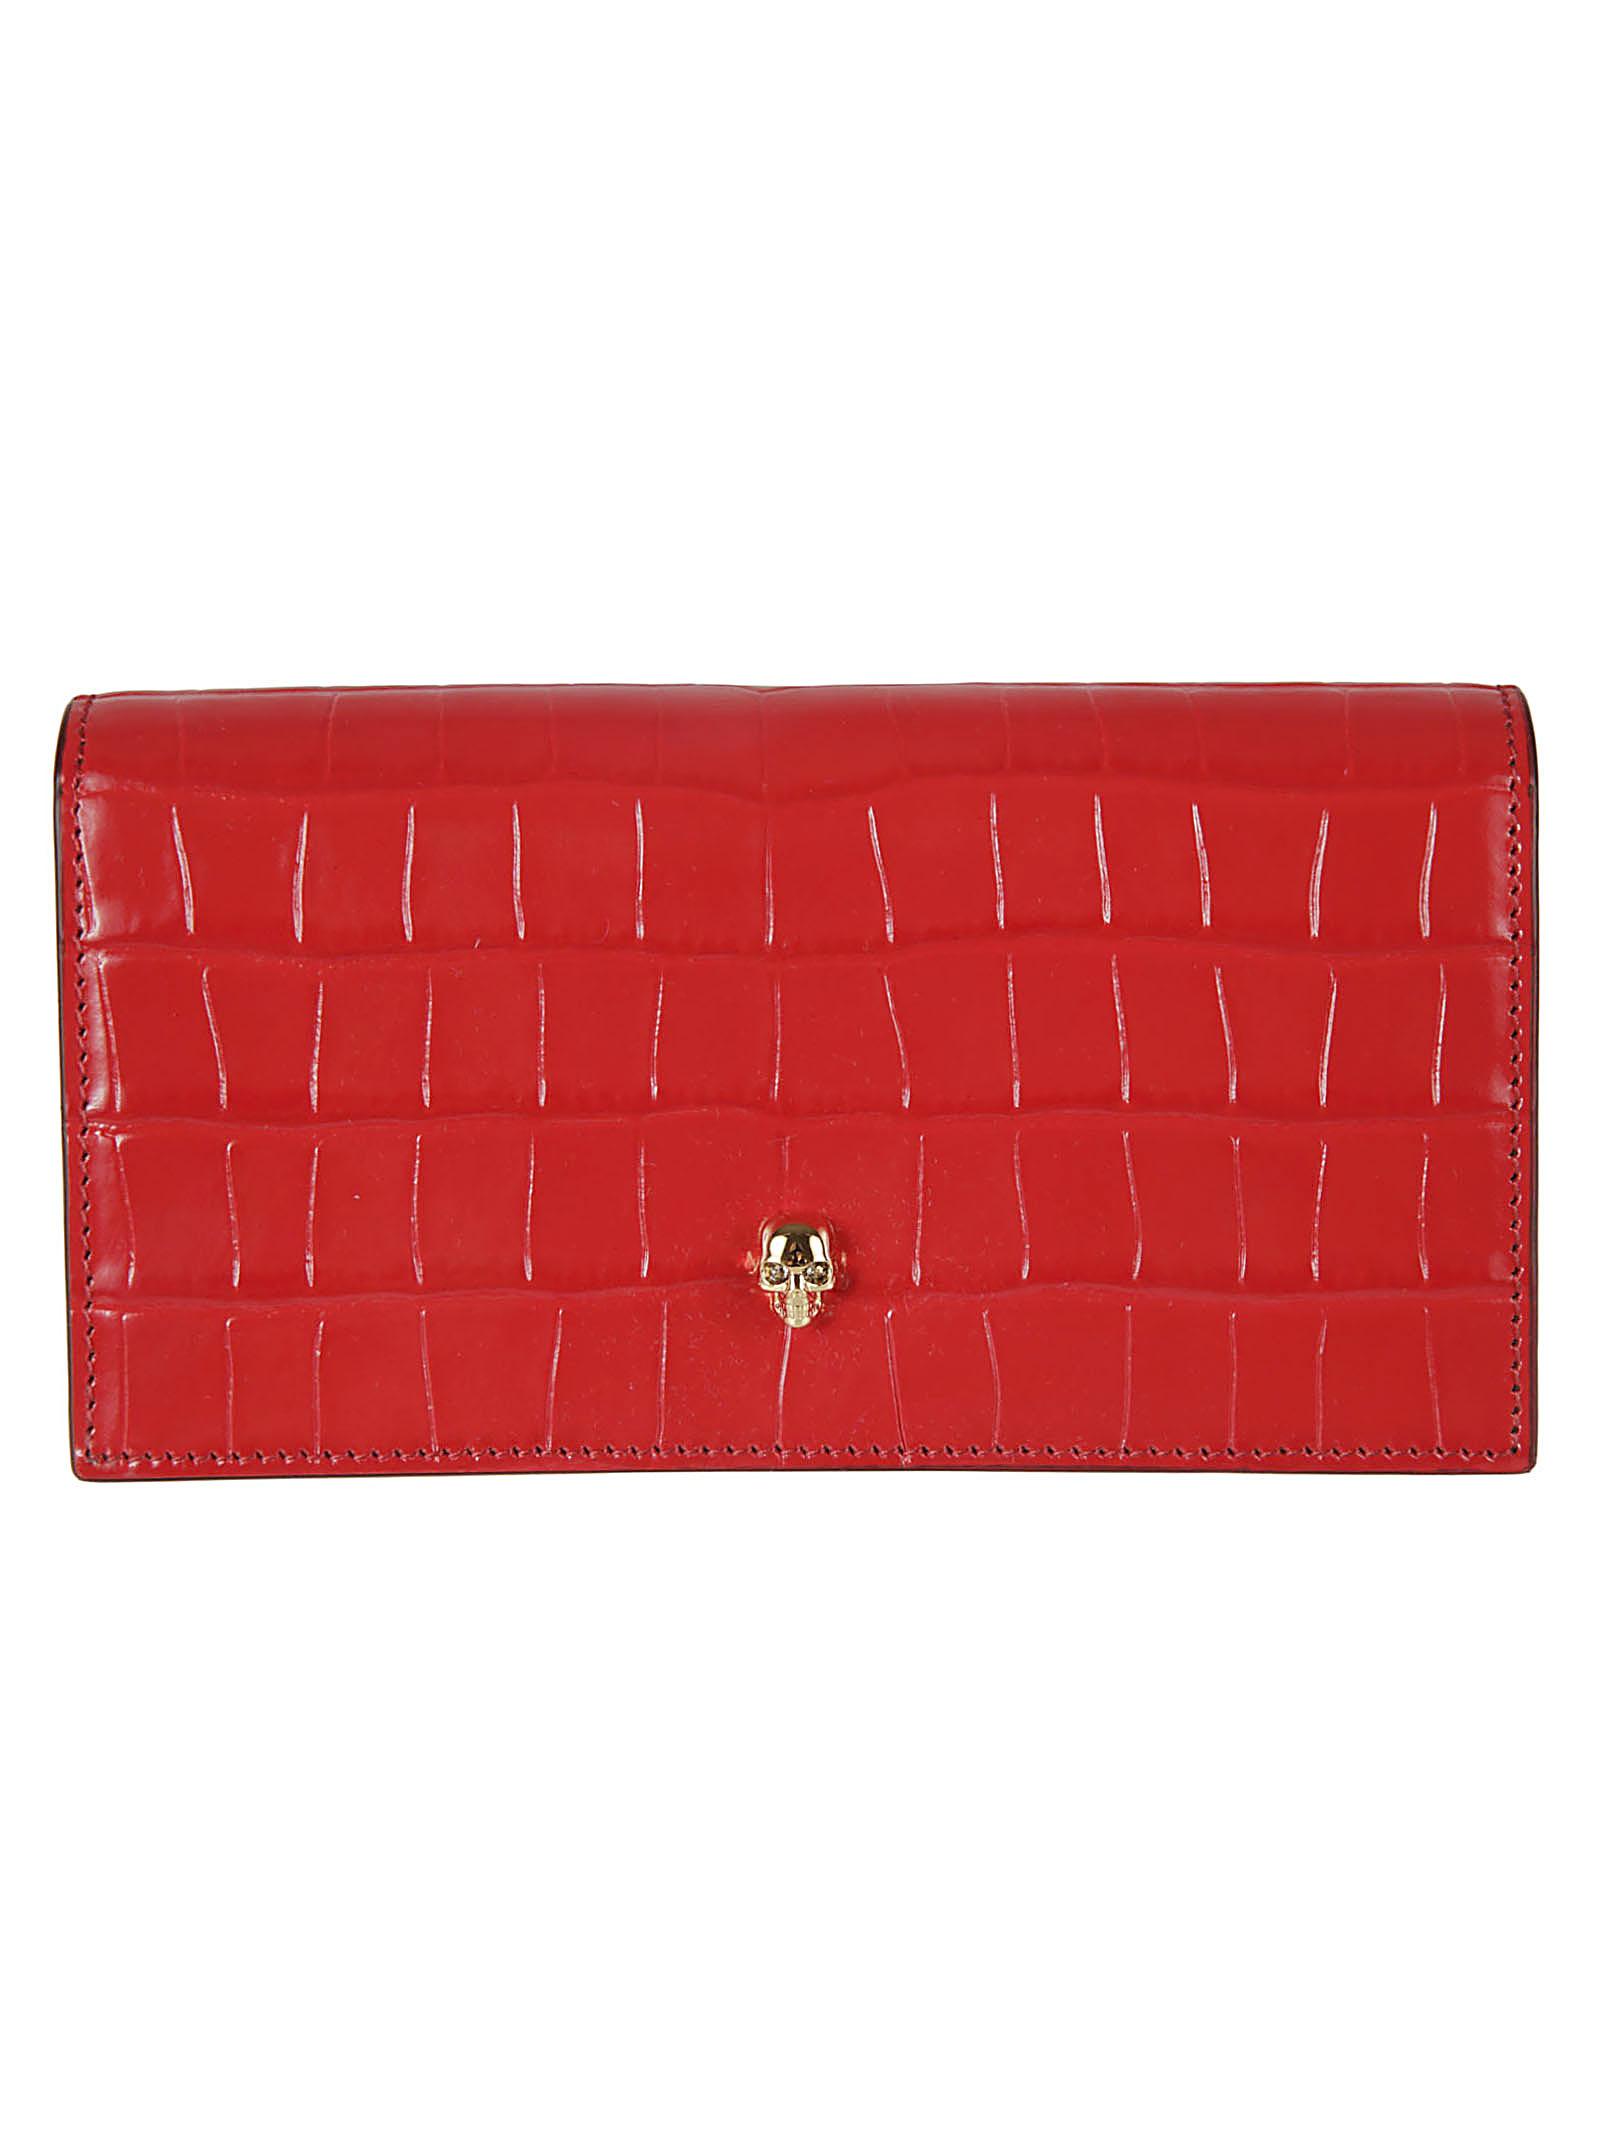 Alexander Mcqueen Flap Continental Wallet In Deep Red